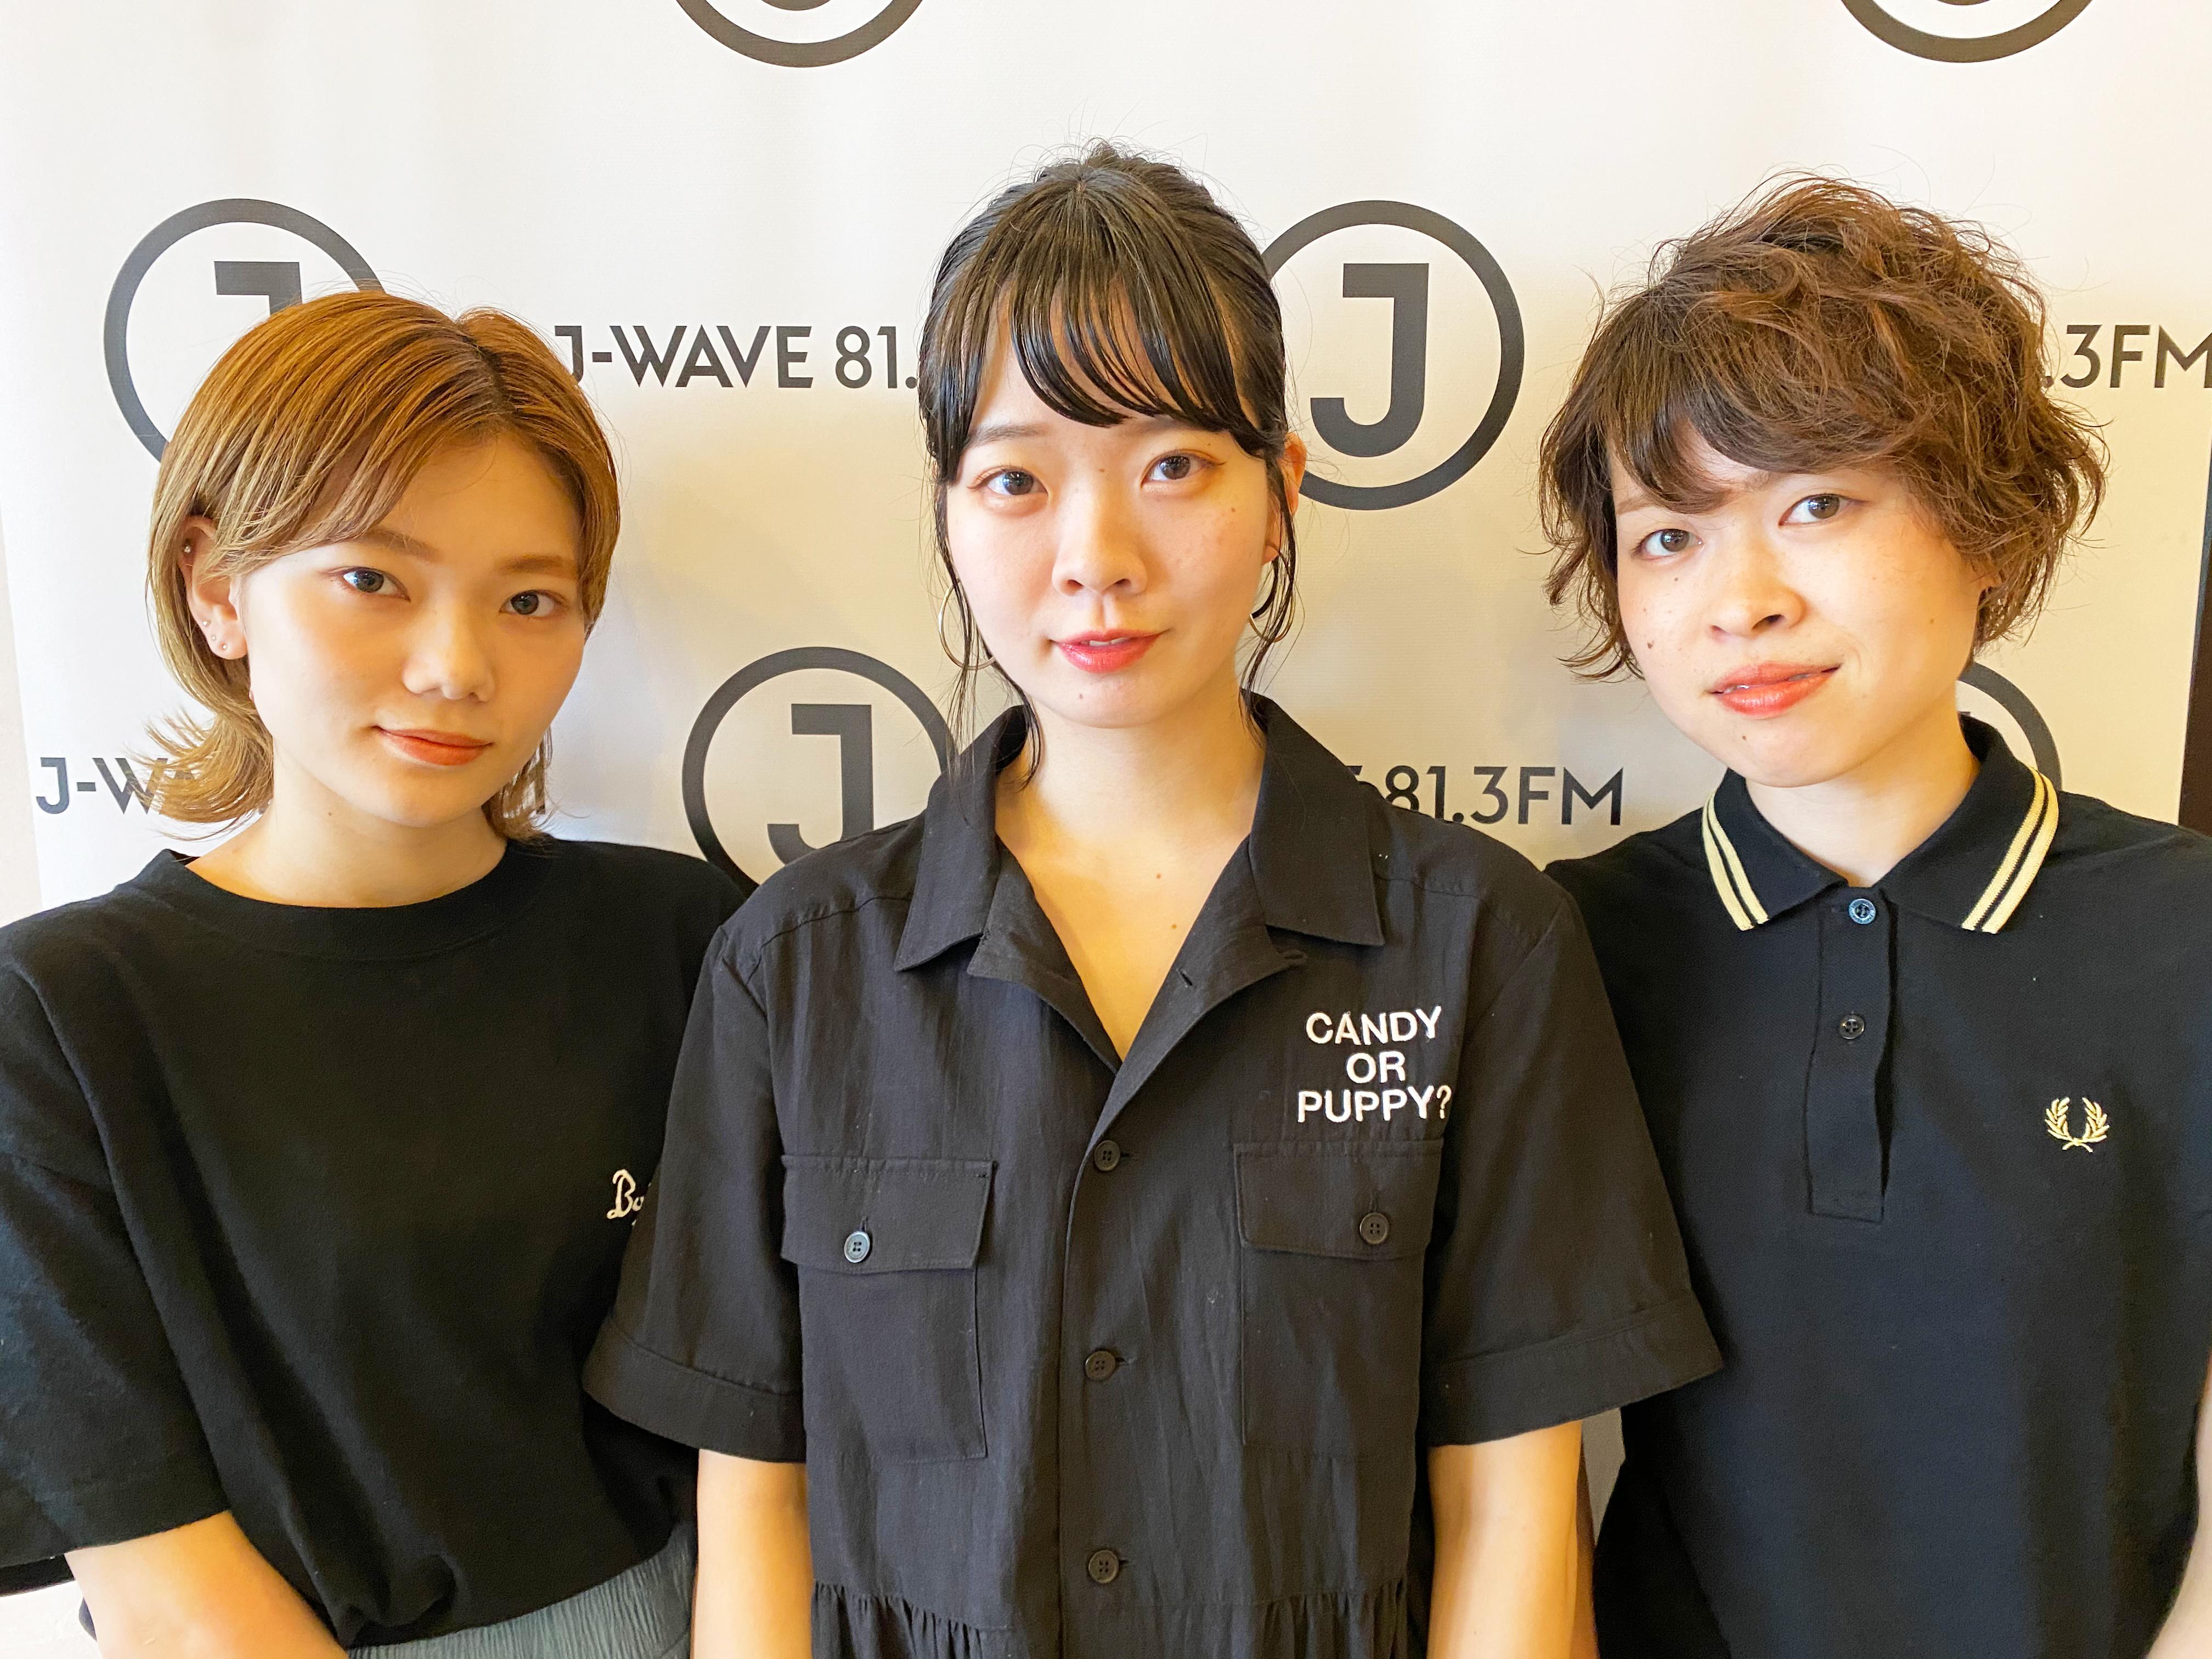 https://www.j-wave.co.jp/blog/spark/images/0615_SHISHAMO.jpg